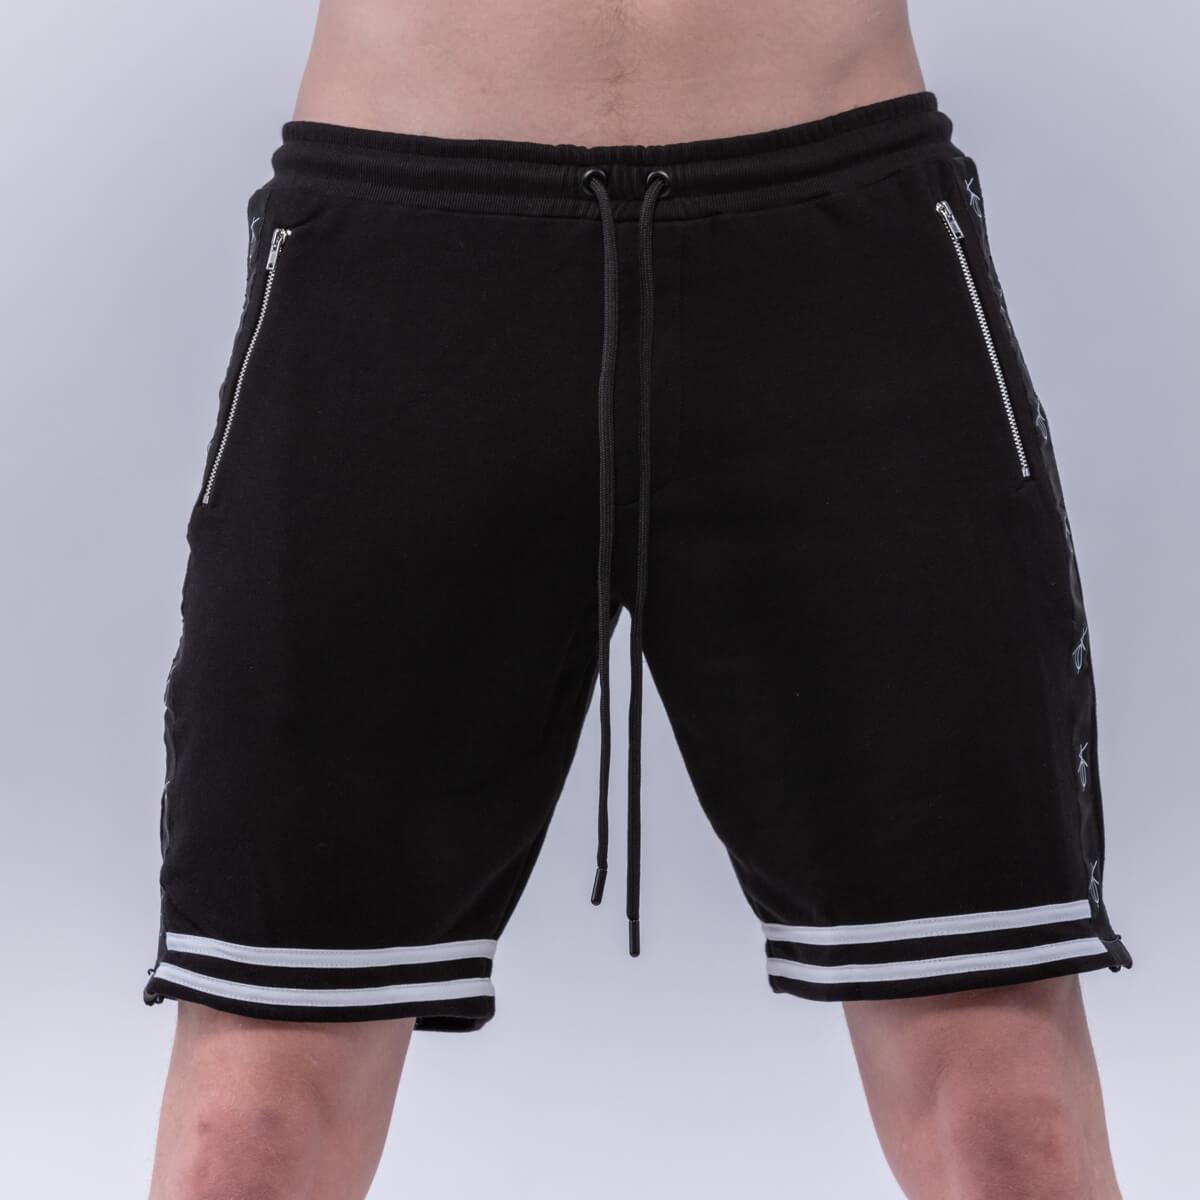 Men's Shorts   Private Label Short Manufacturer: Men's Basketball Short - Cotton Polyester Fleece - Black - Long Cord - Spring Summer - Fashion Apparel